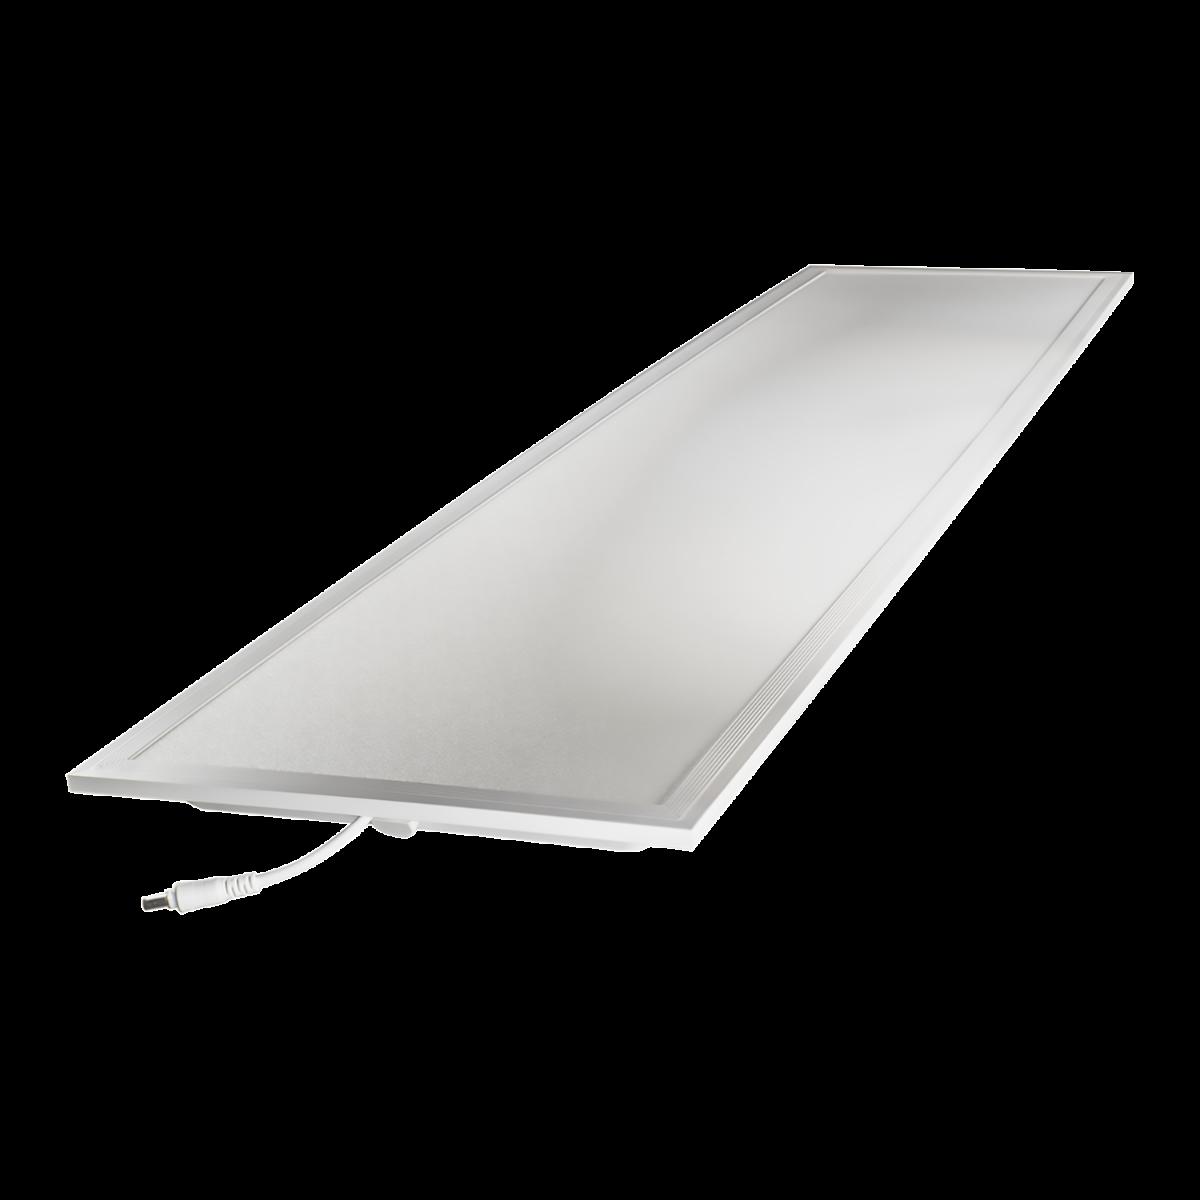 Noxion Panel LED Delta Pro V2.0 30W 30x120cm 4000K 4110lm UGR <19 | Blanco Frio - Reemplazo 2x36W